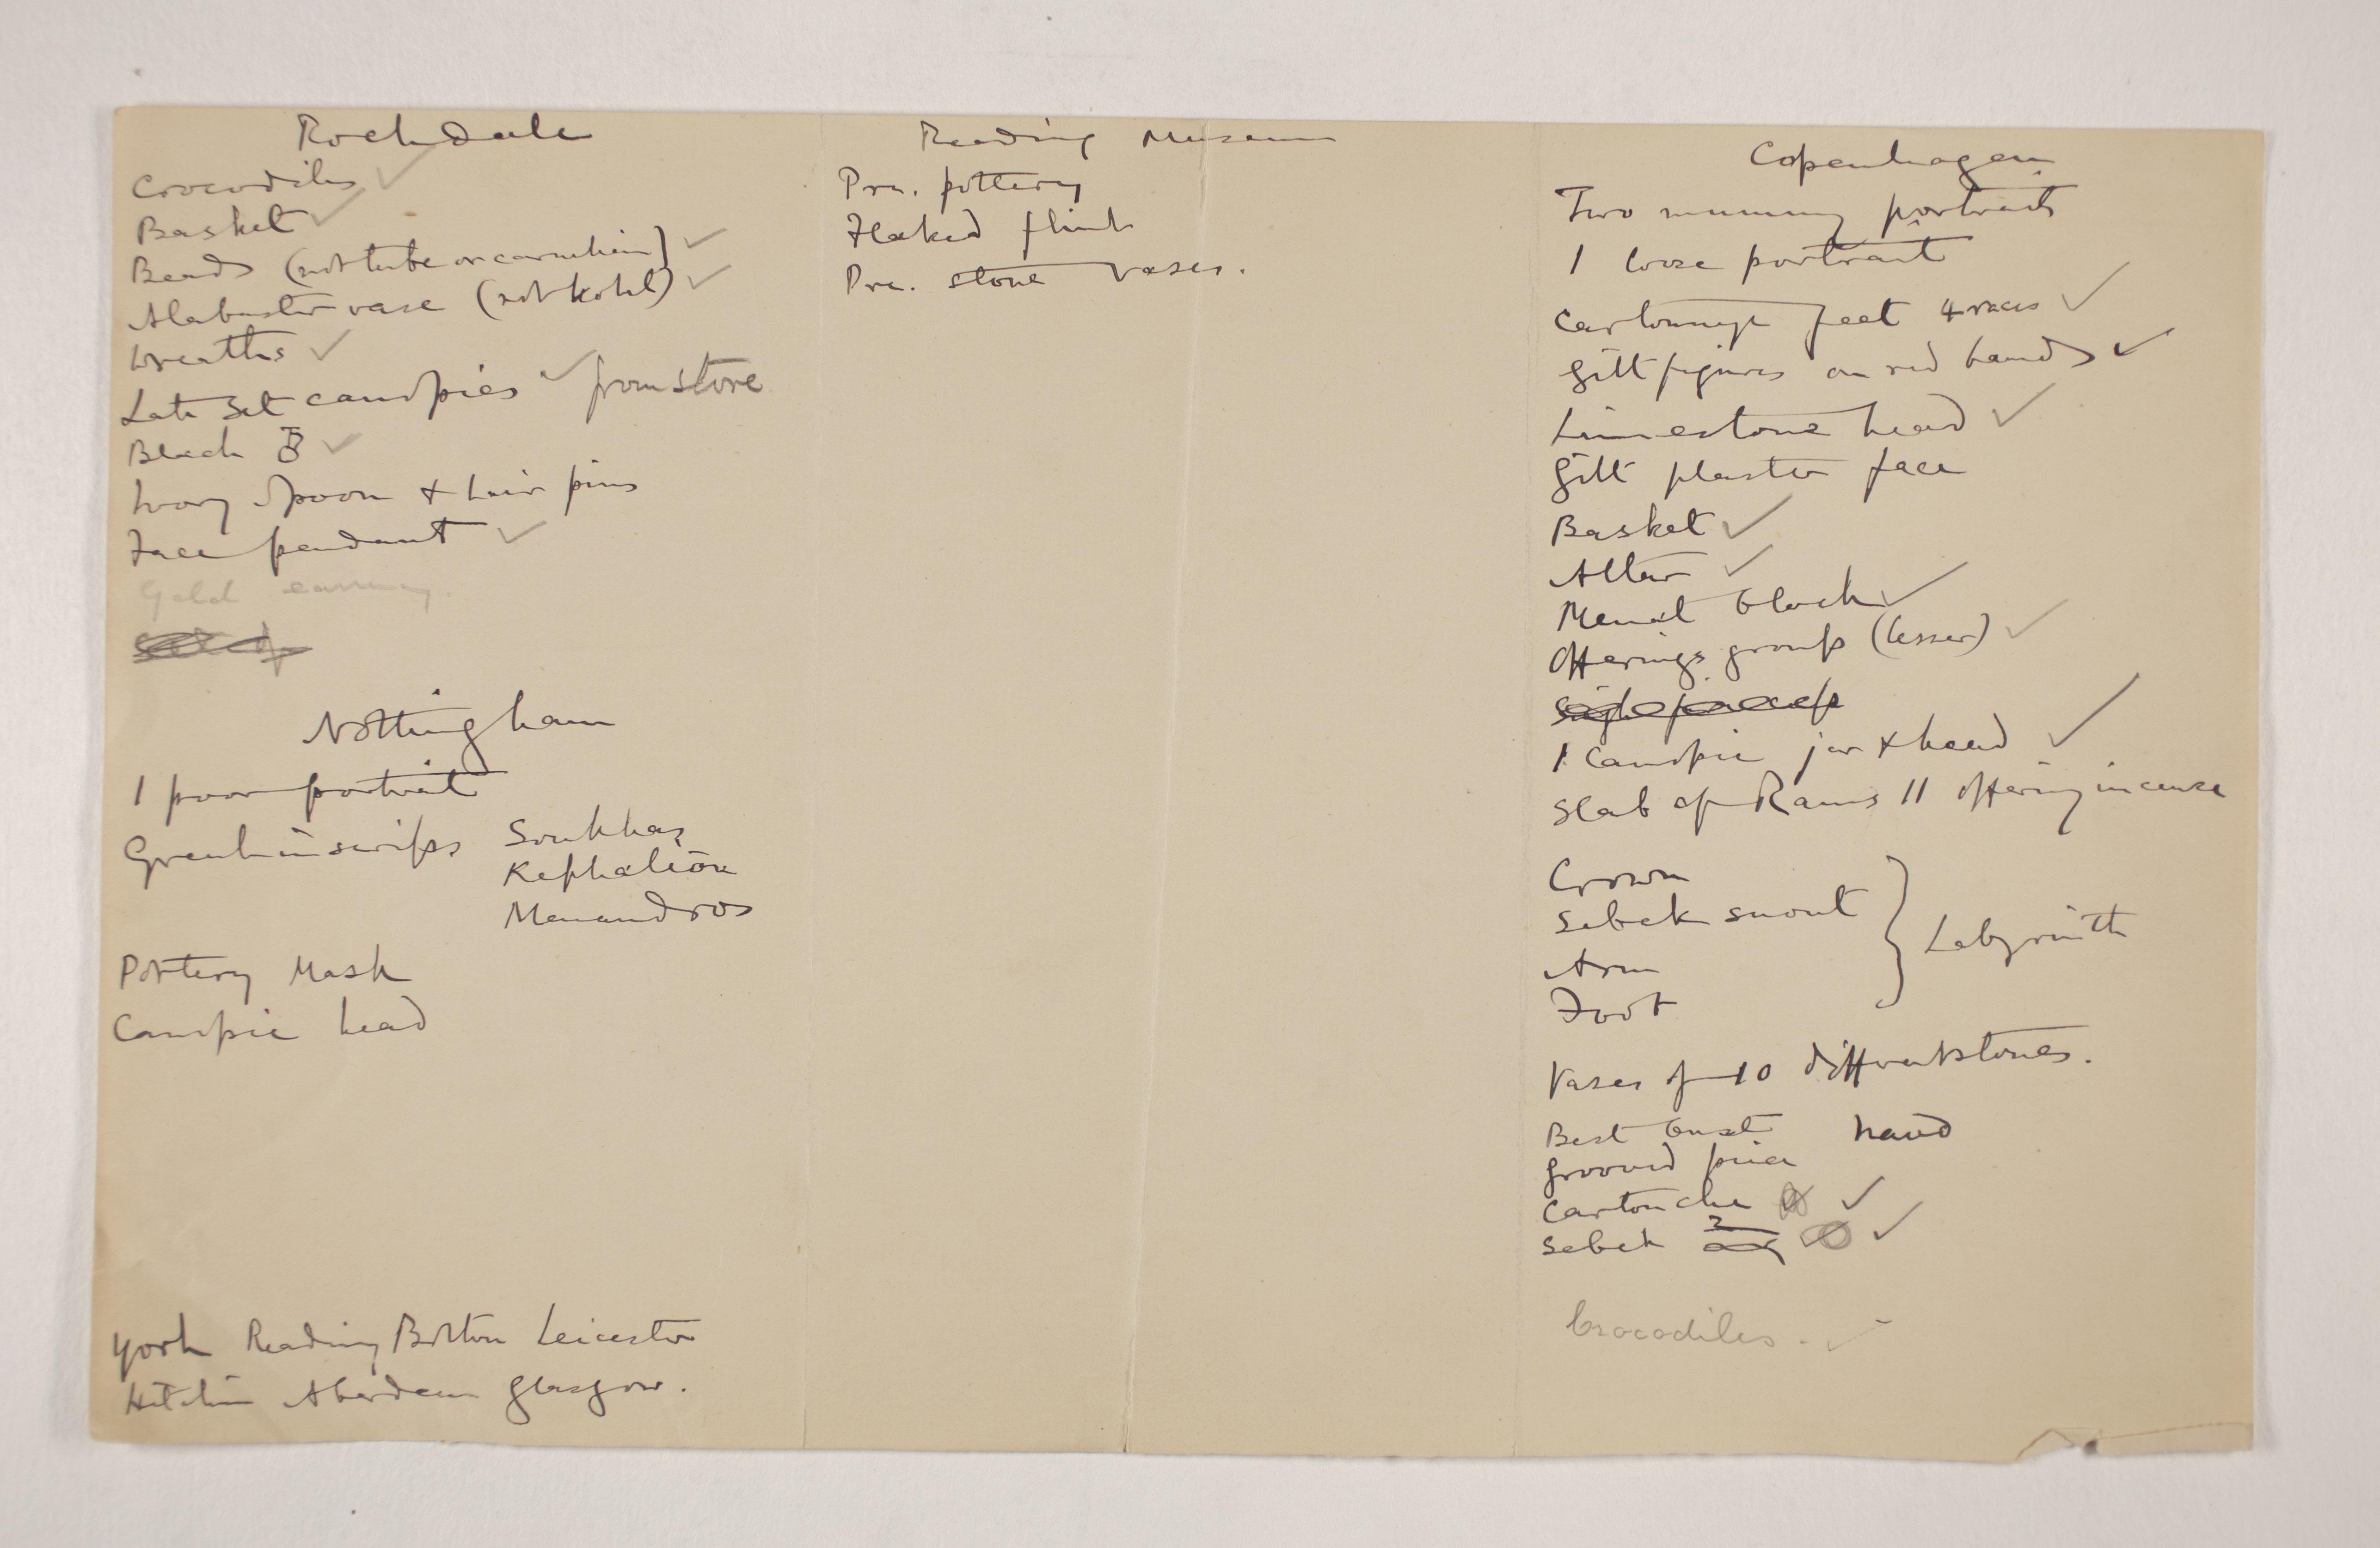 1910-11 Hawara, Gerzeh, Memphis, Mazghuneh Multiple institution list PMA/WFP1/D/19/11